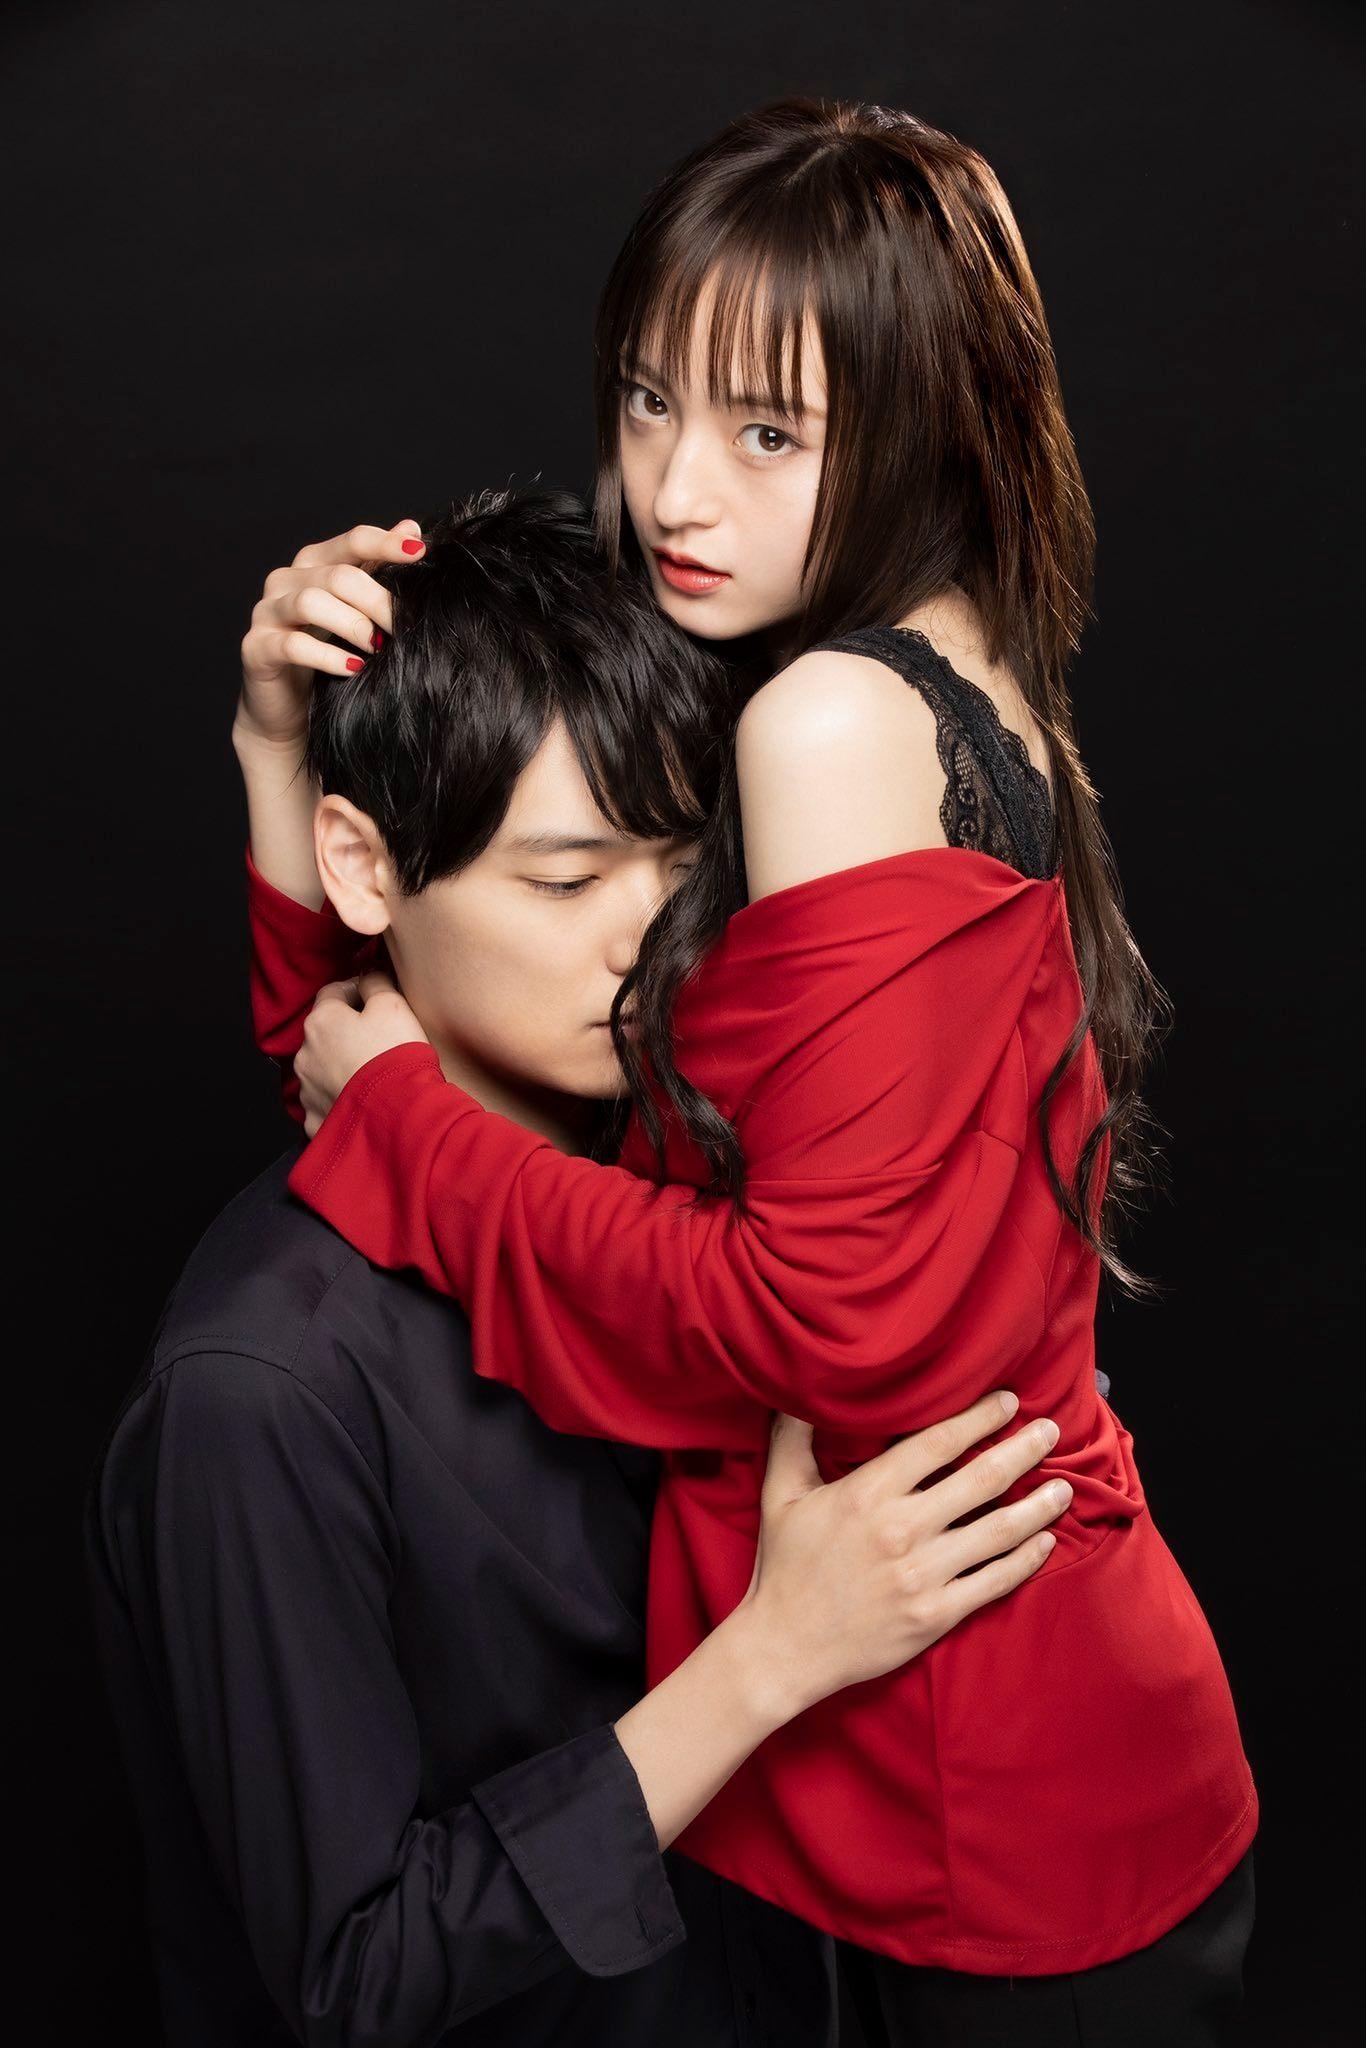 Risky Trả Thù Là Mùi Vị Tội Lỗi - RISKY~復讐は罪の味~ (2021)